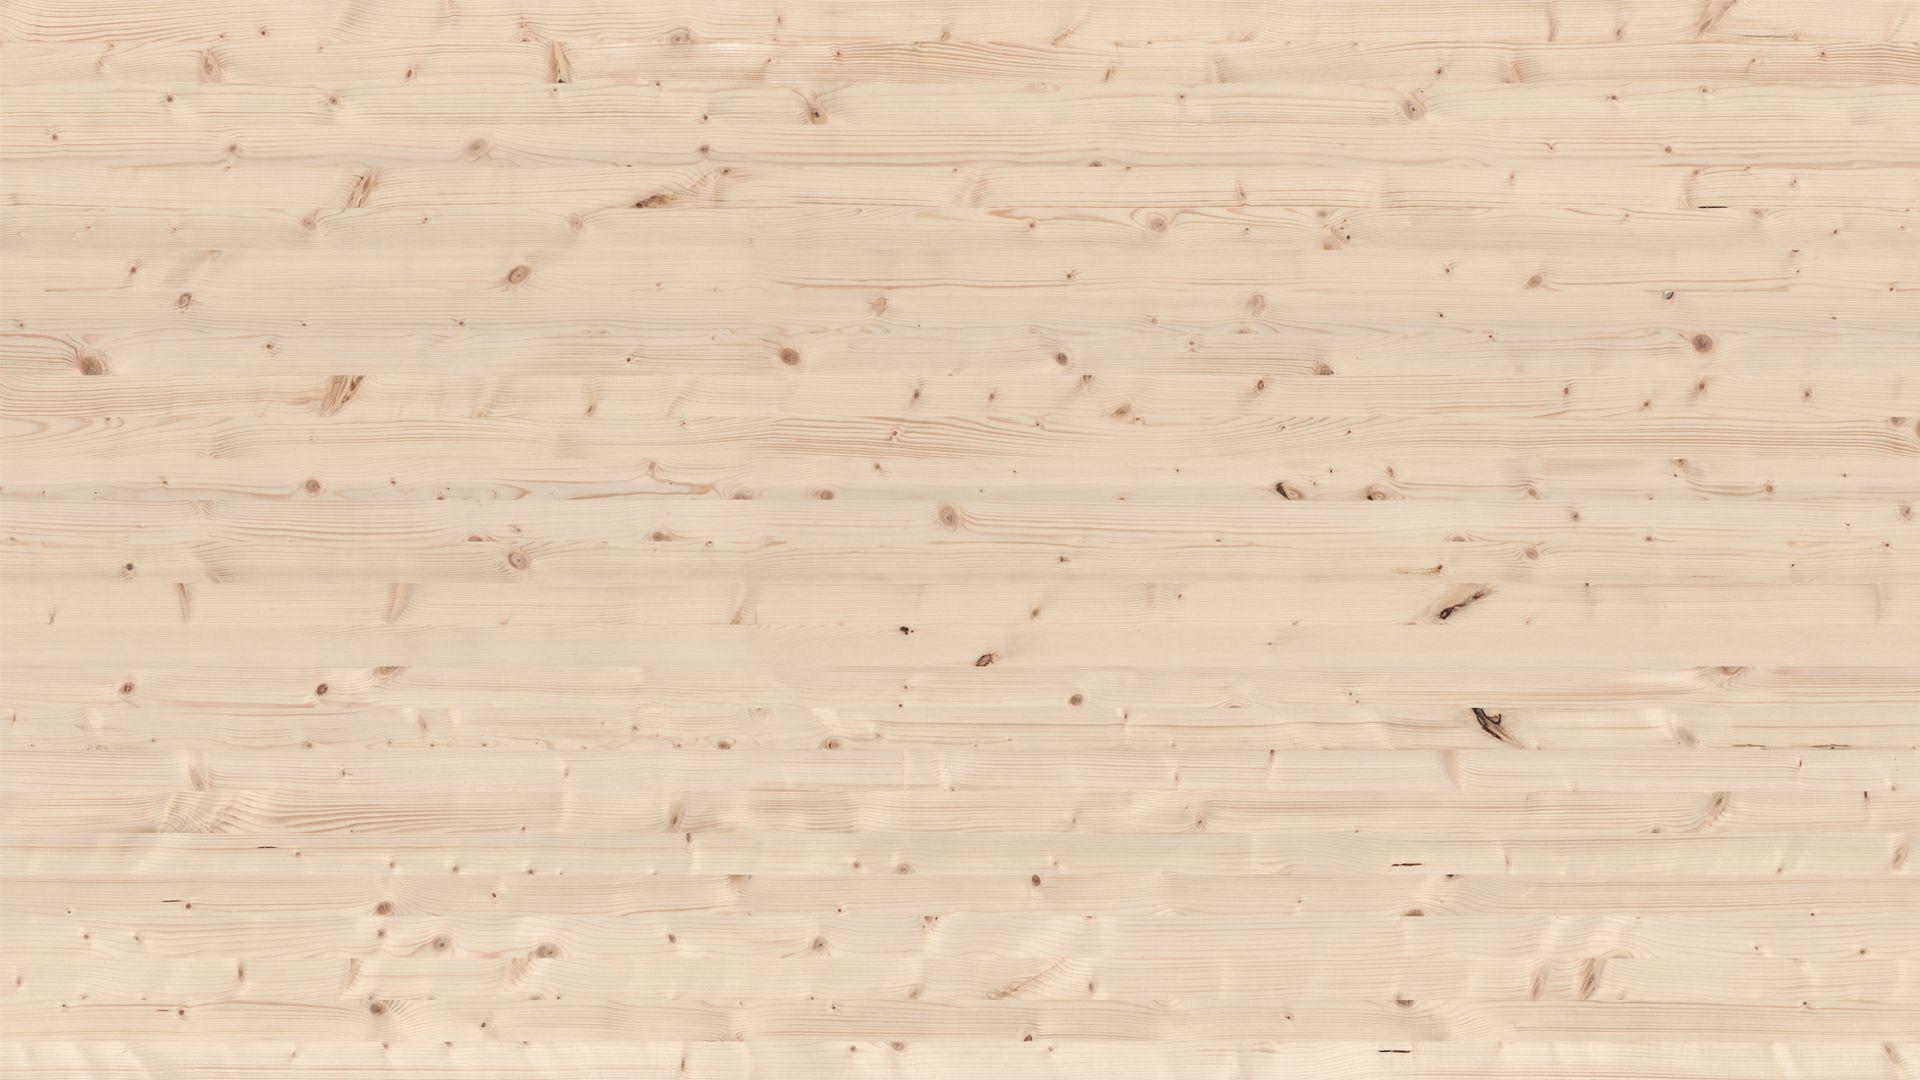 Piedroit SL1 Wooden texture | FlyingArchitecture